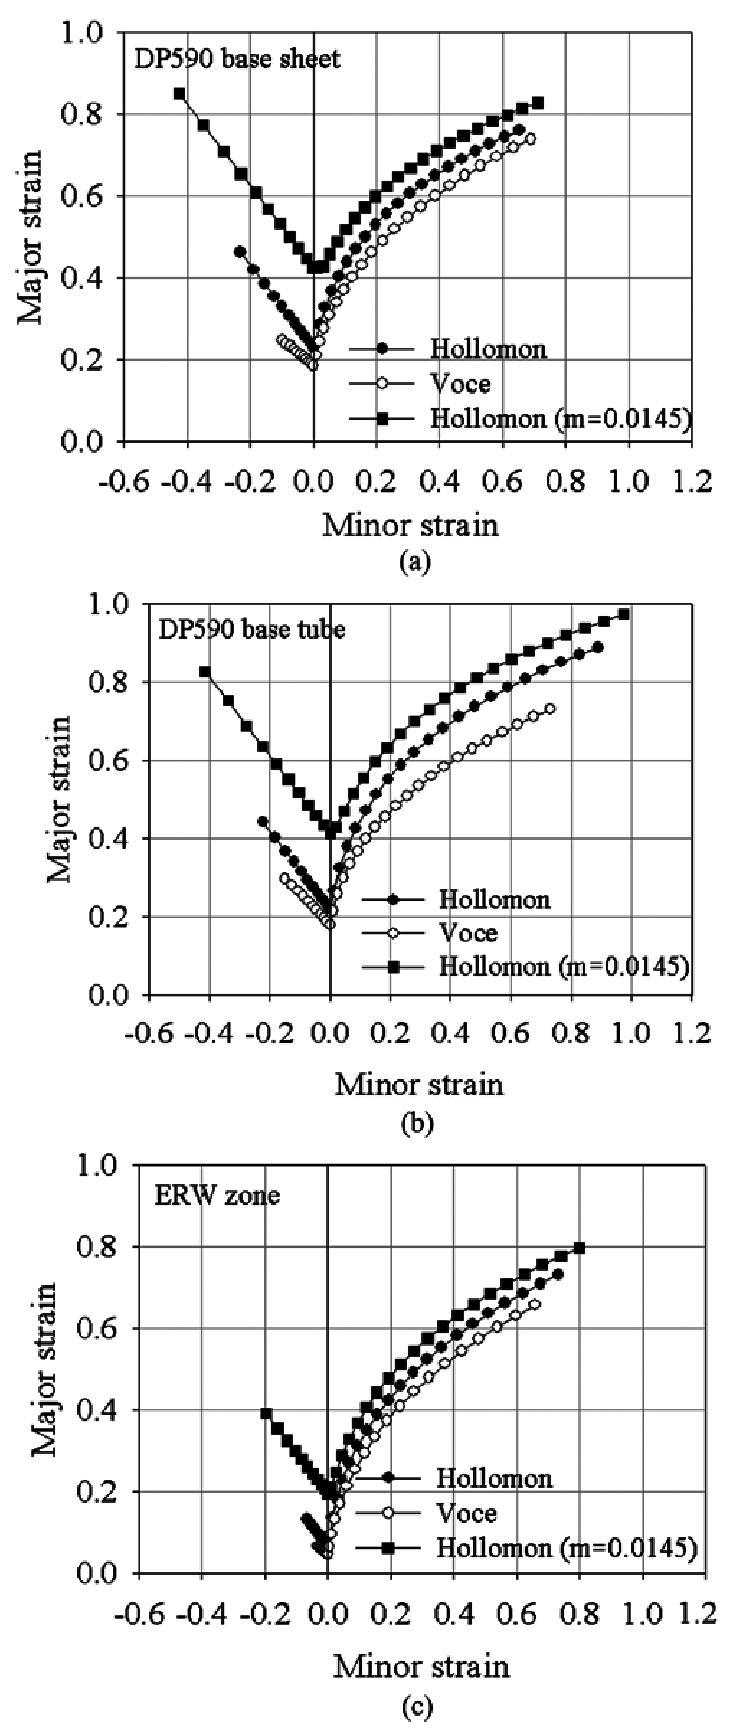 medium resolution of calculated forming limit diagrams a dp590 base sheet b dp590 base